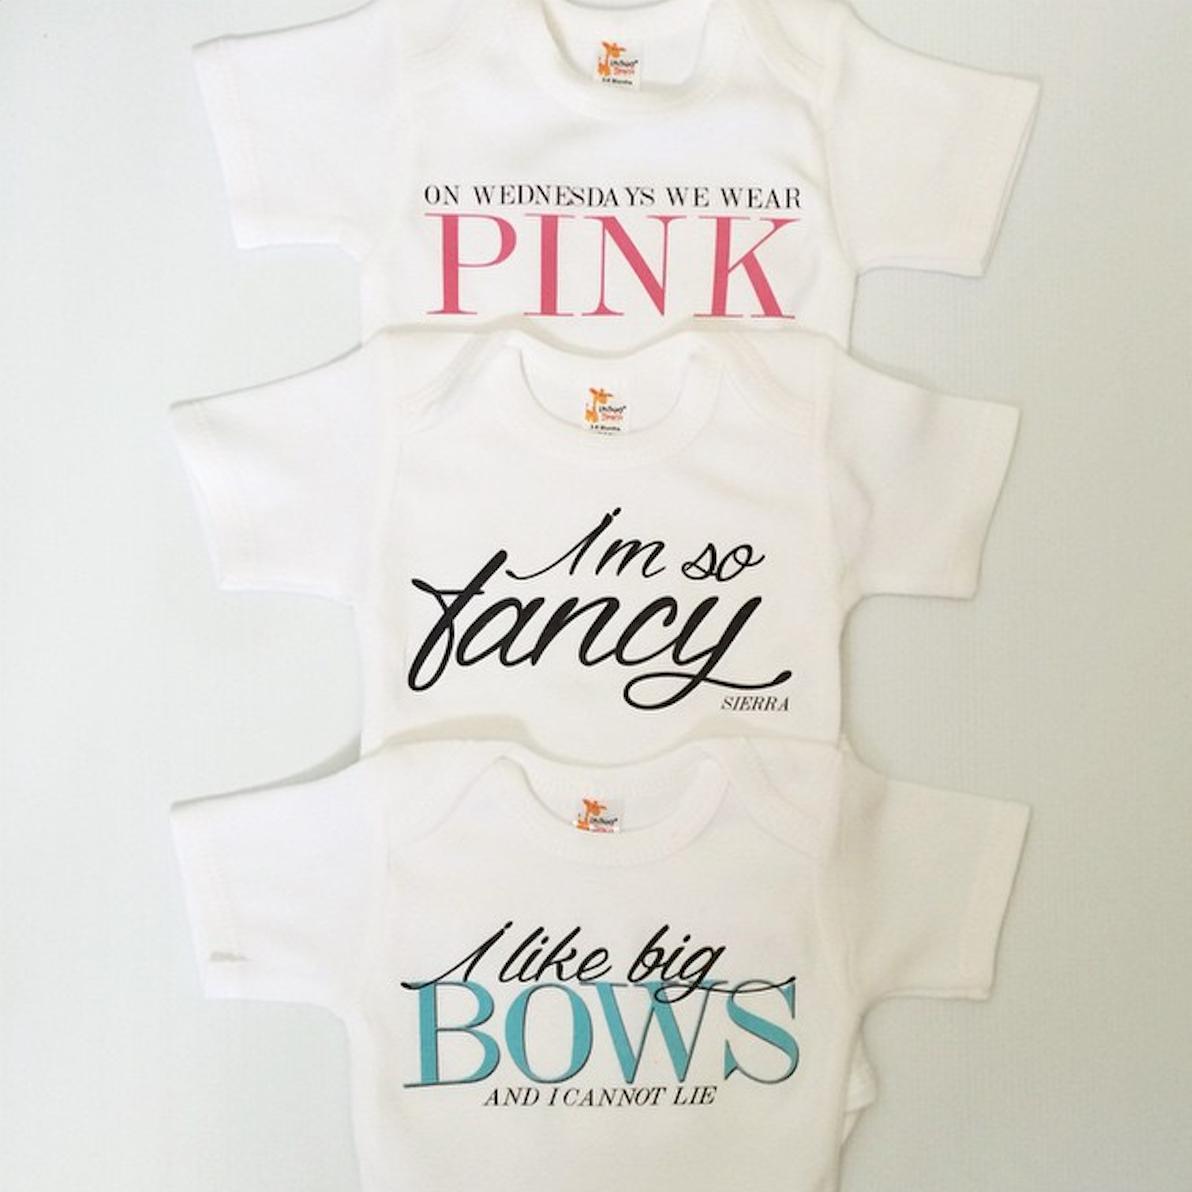 On Wednesdays We Wear Pink Baby Onesie Cutomised Baby